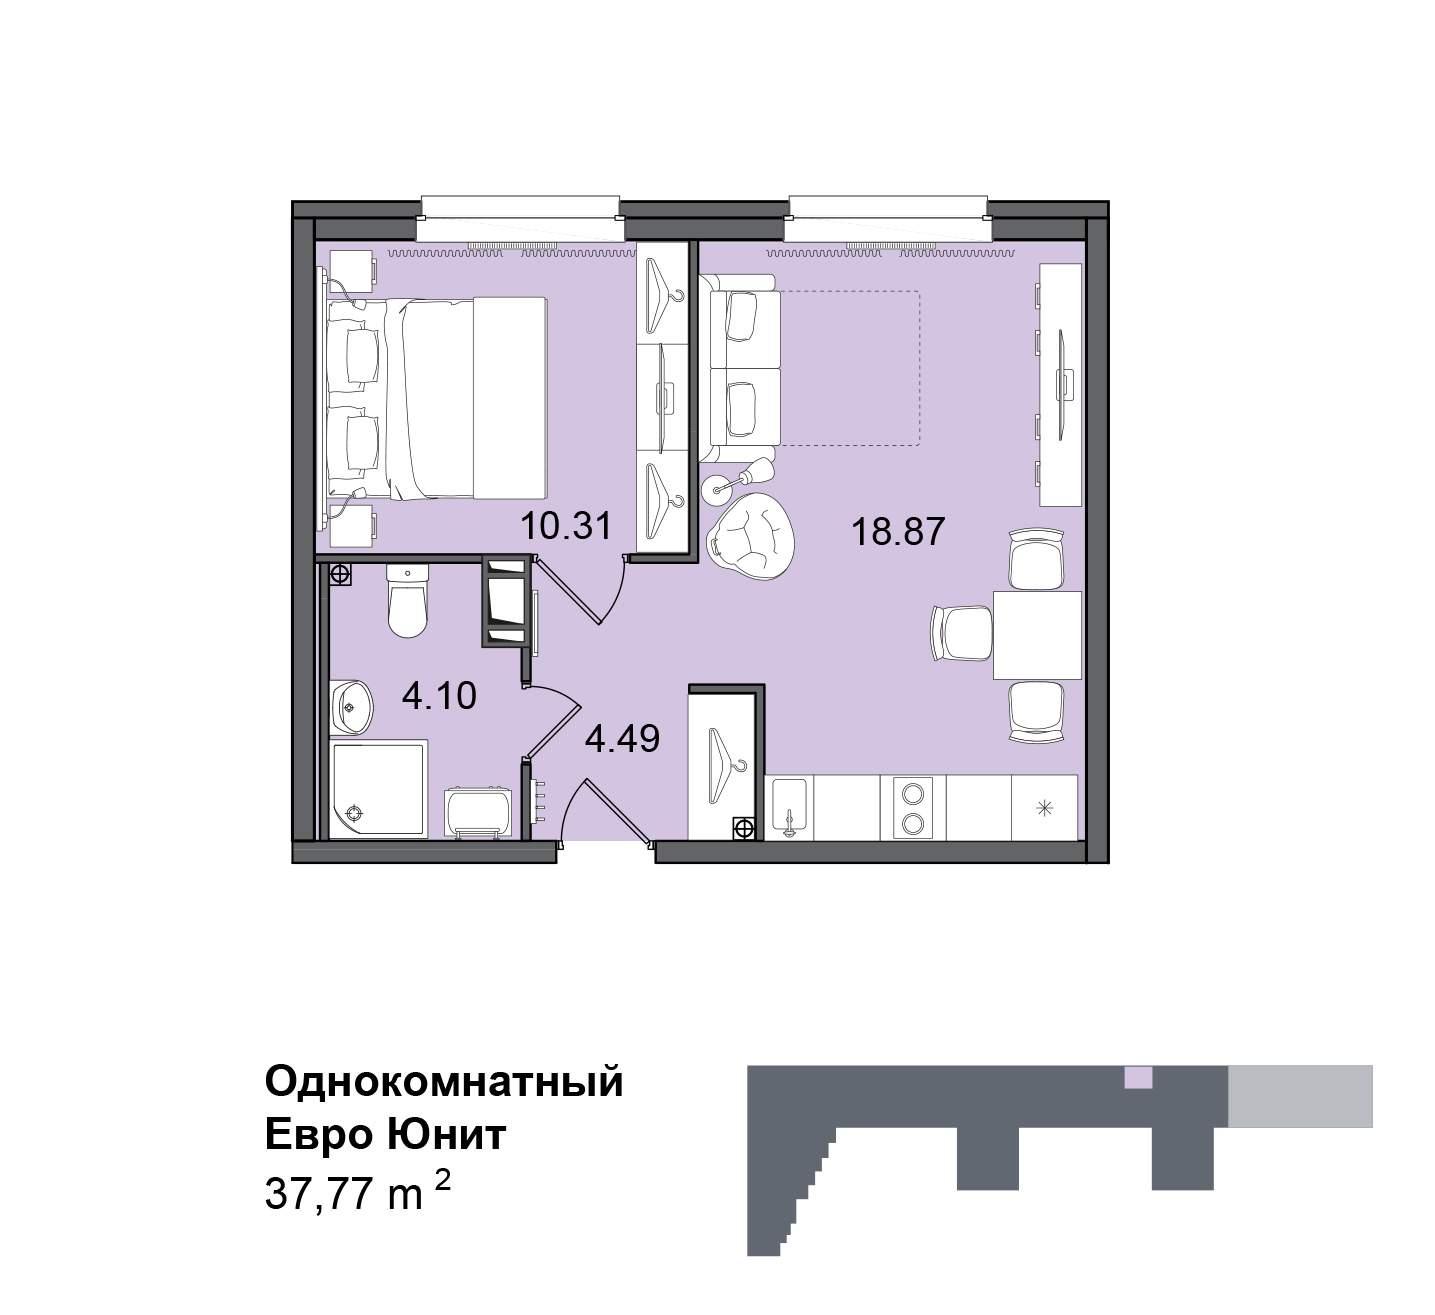 Витебский проспект, д.101к2